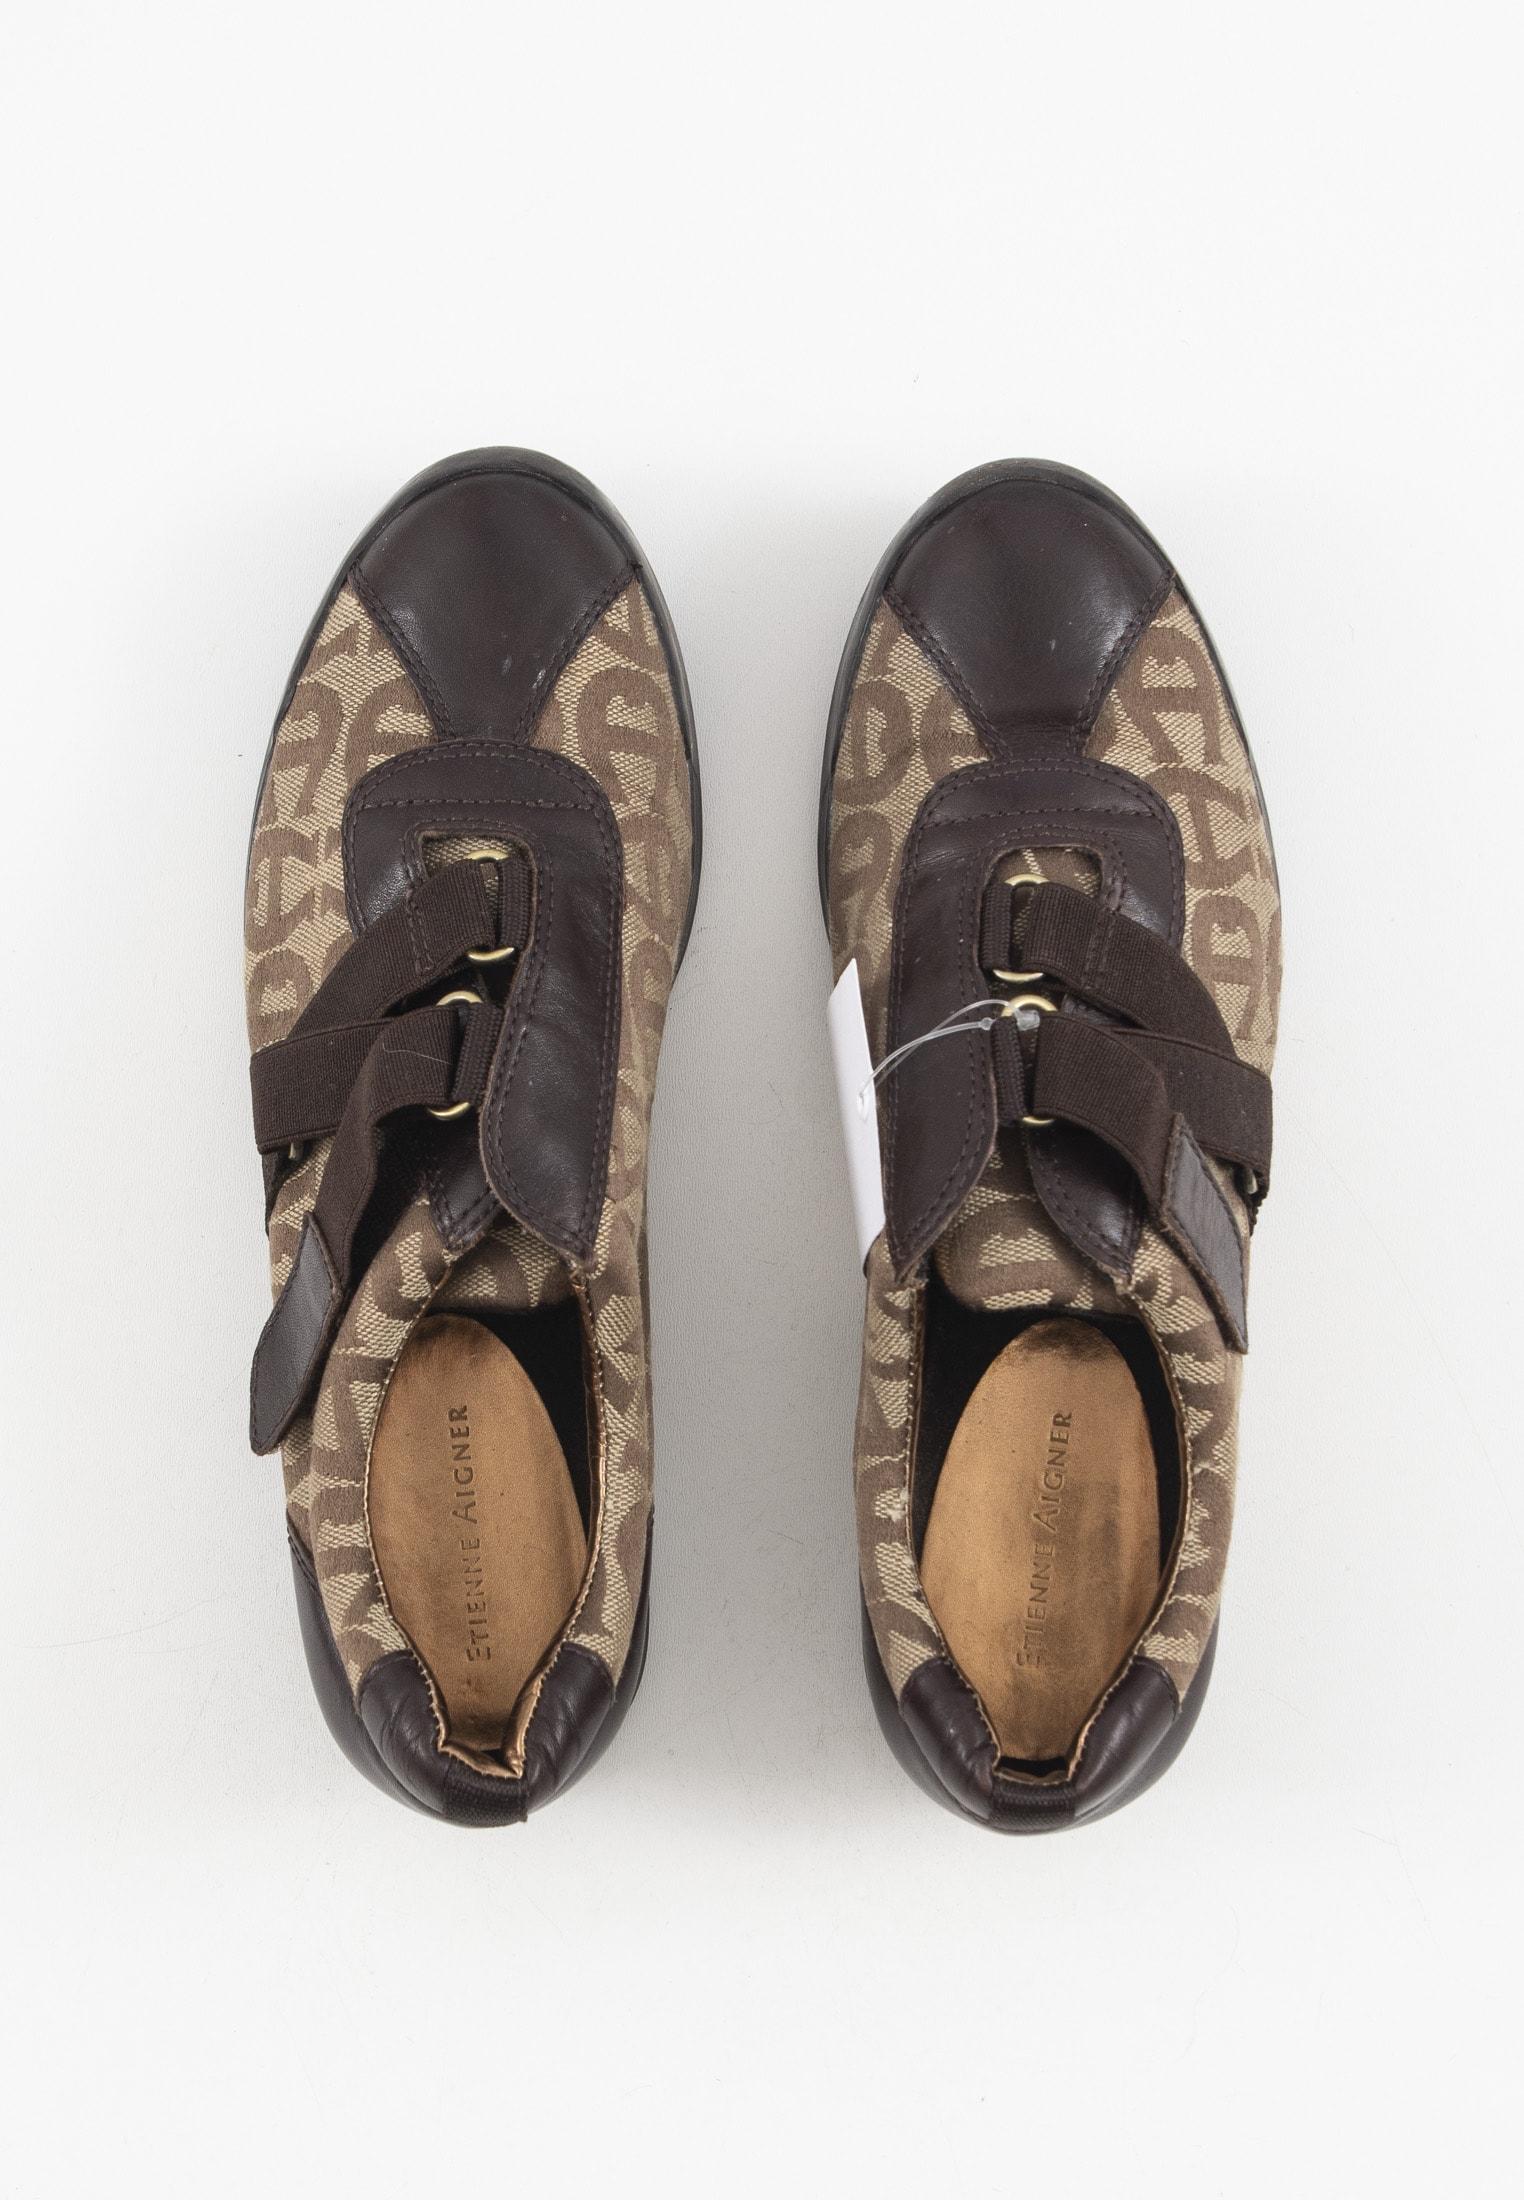 Aigner Sneakers Braun Gr.40.5